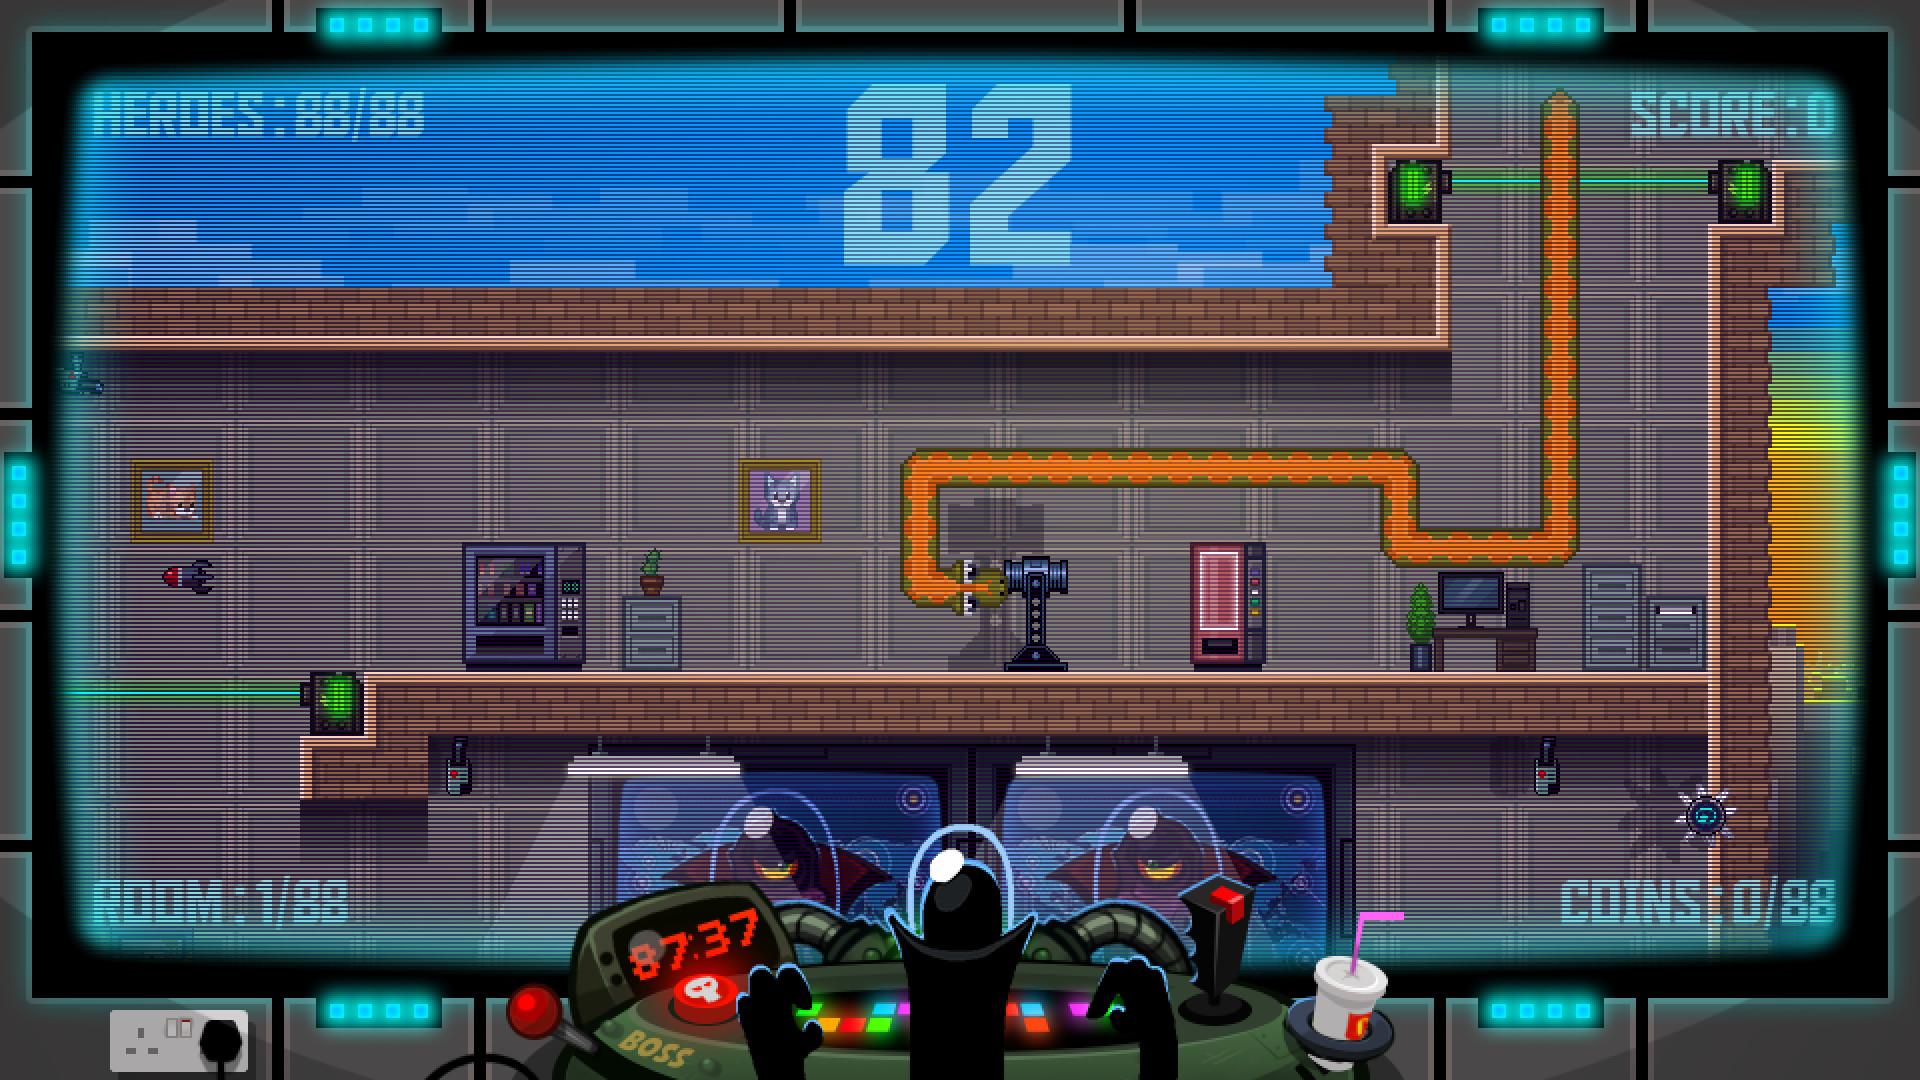 88 Heroes Screenshot 1